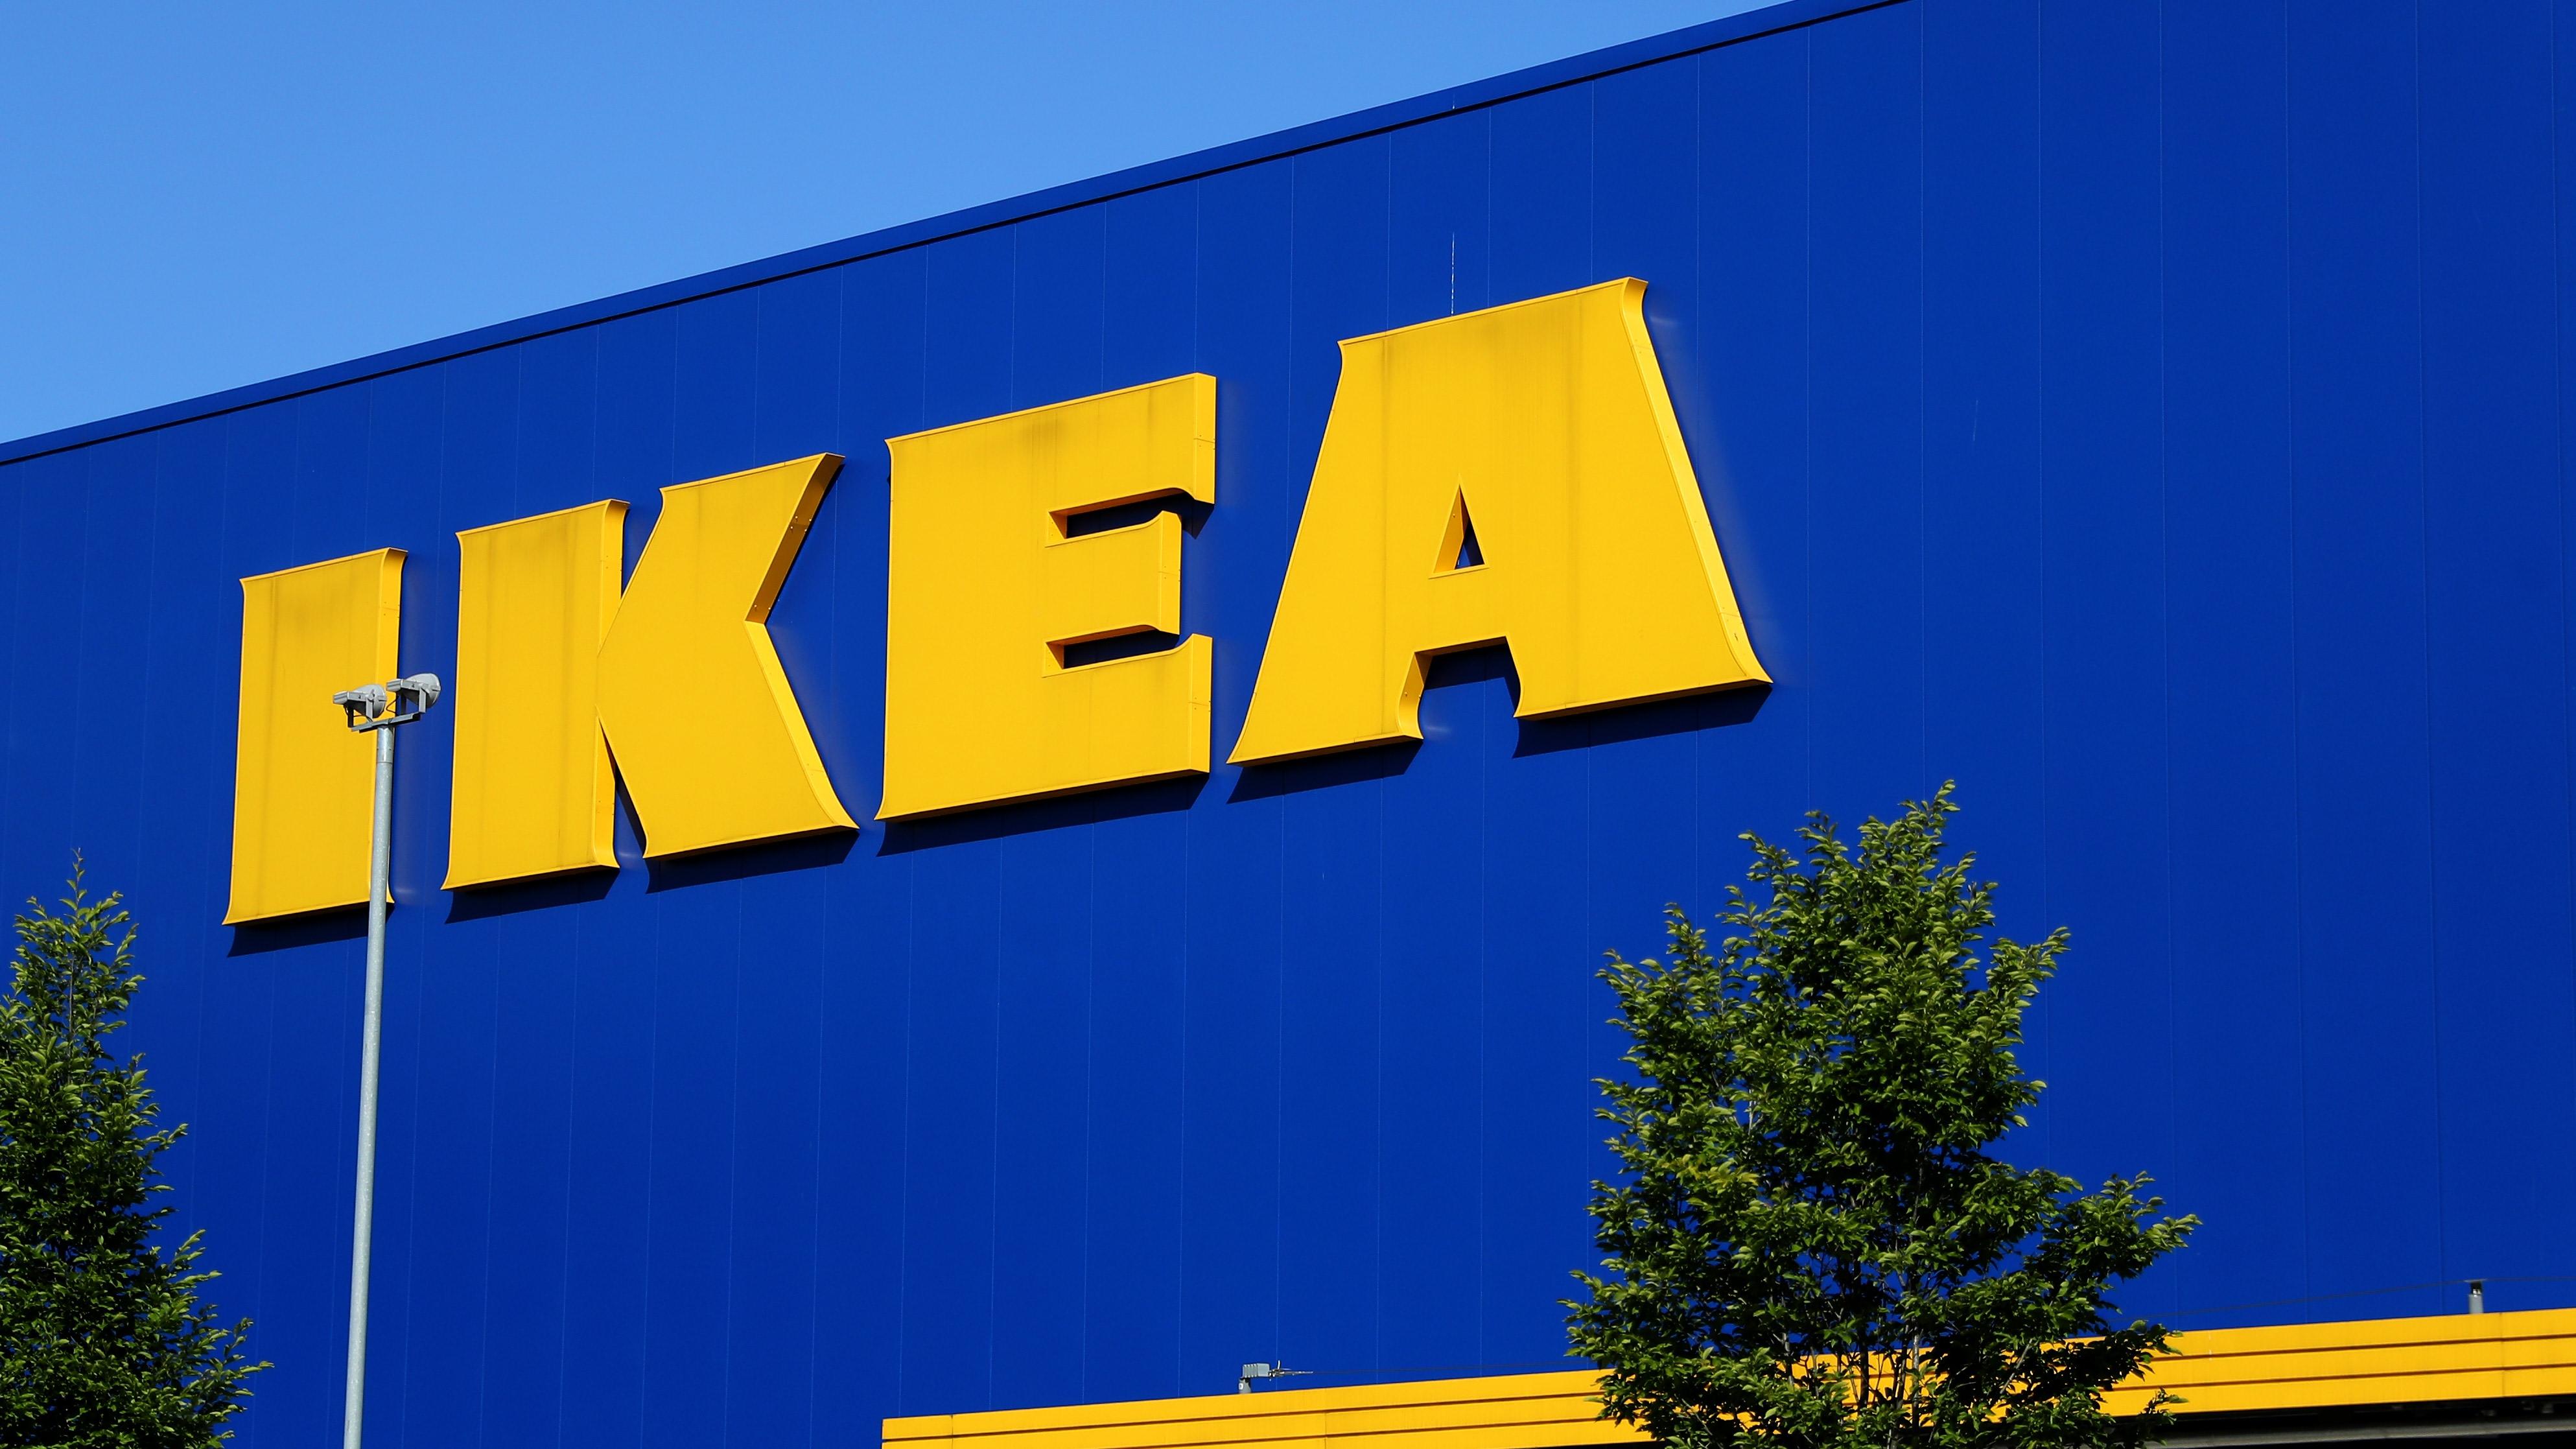 Atlanta IKEA's Juneteenth Menu Results In Mass Employee Callout